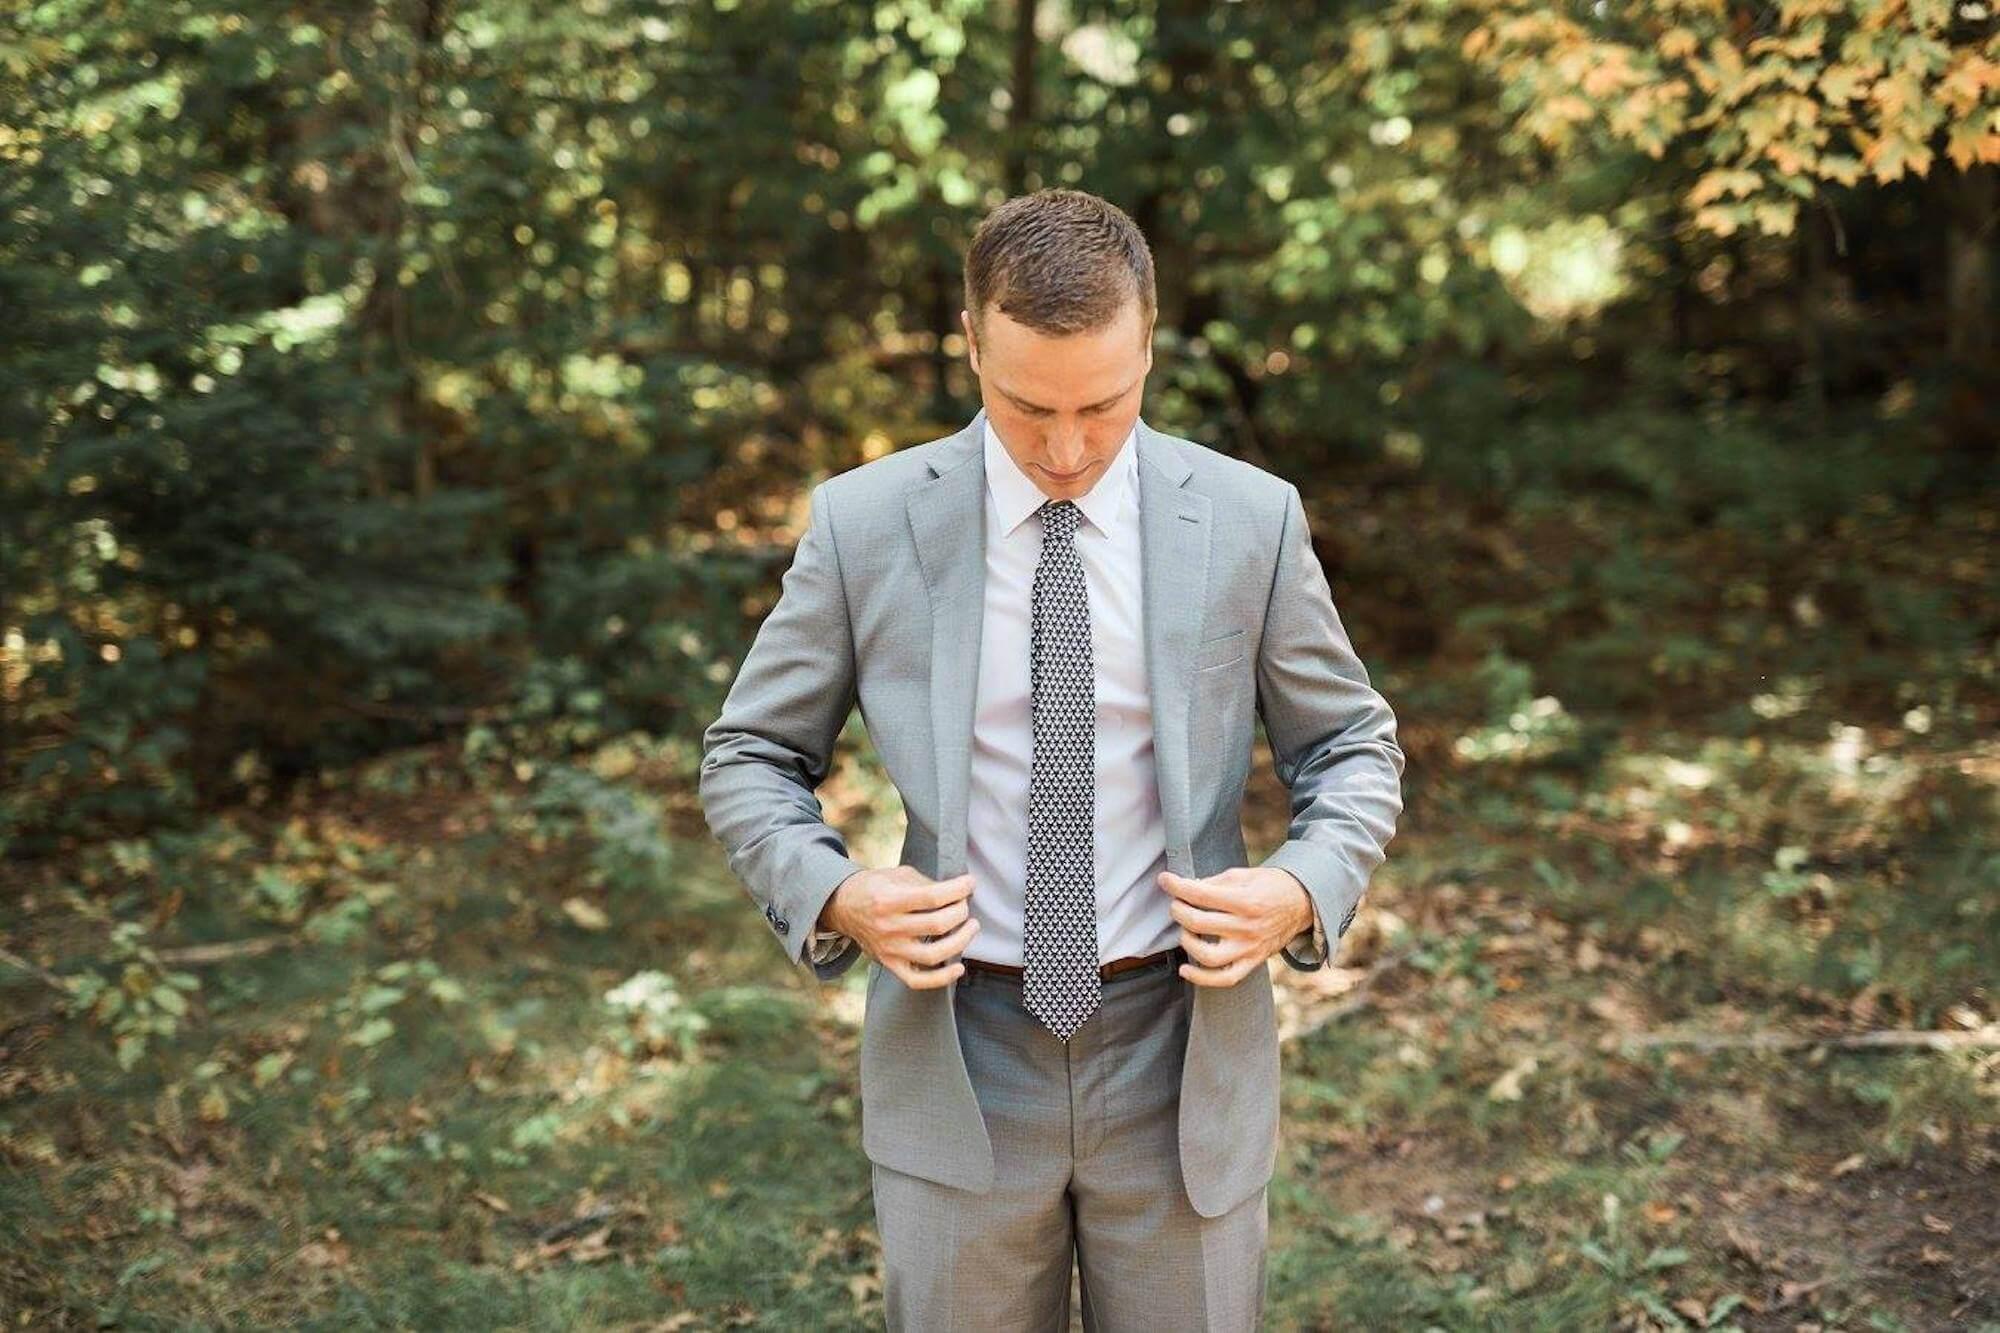 engle-olson-wedding-video-perry-james-photography-26.jpg